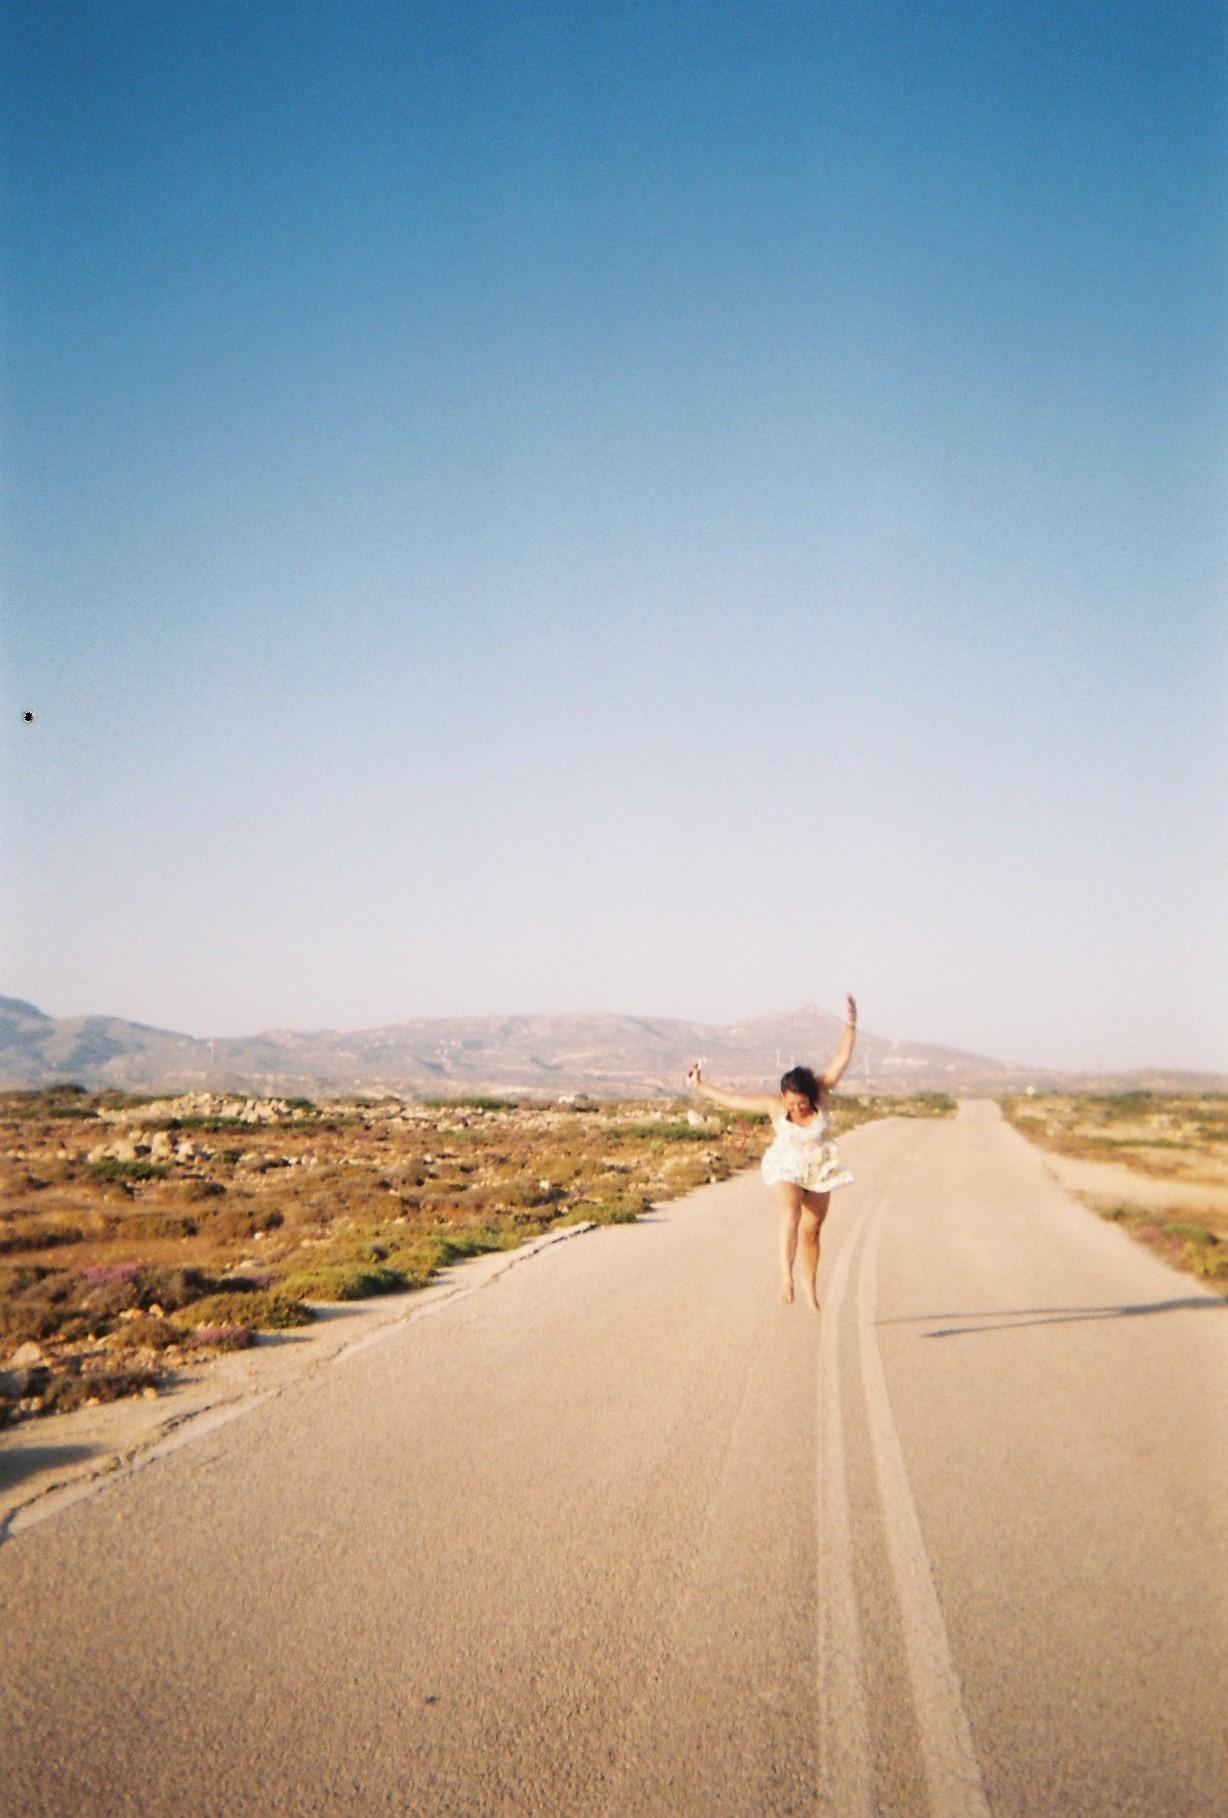 """Free as a Bird"" by Sophia Preka"